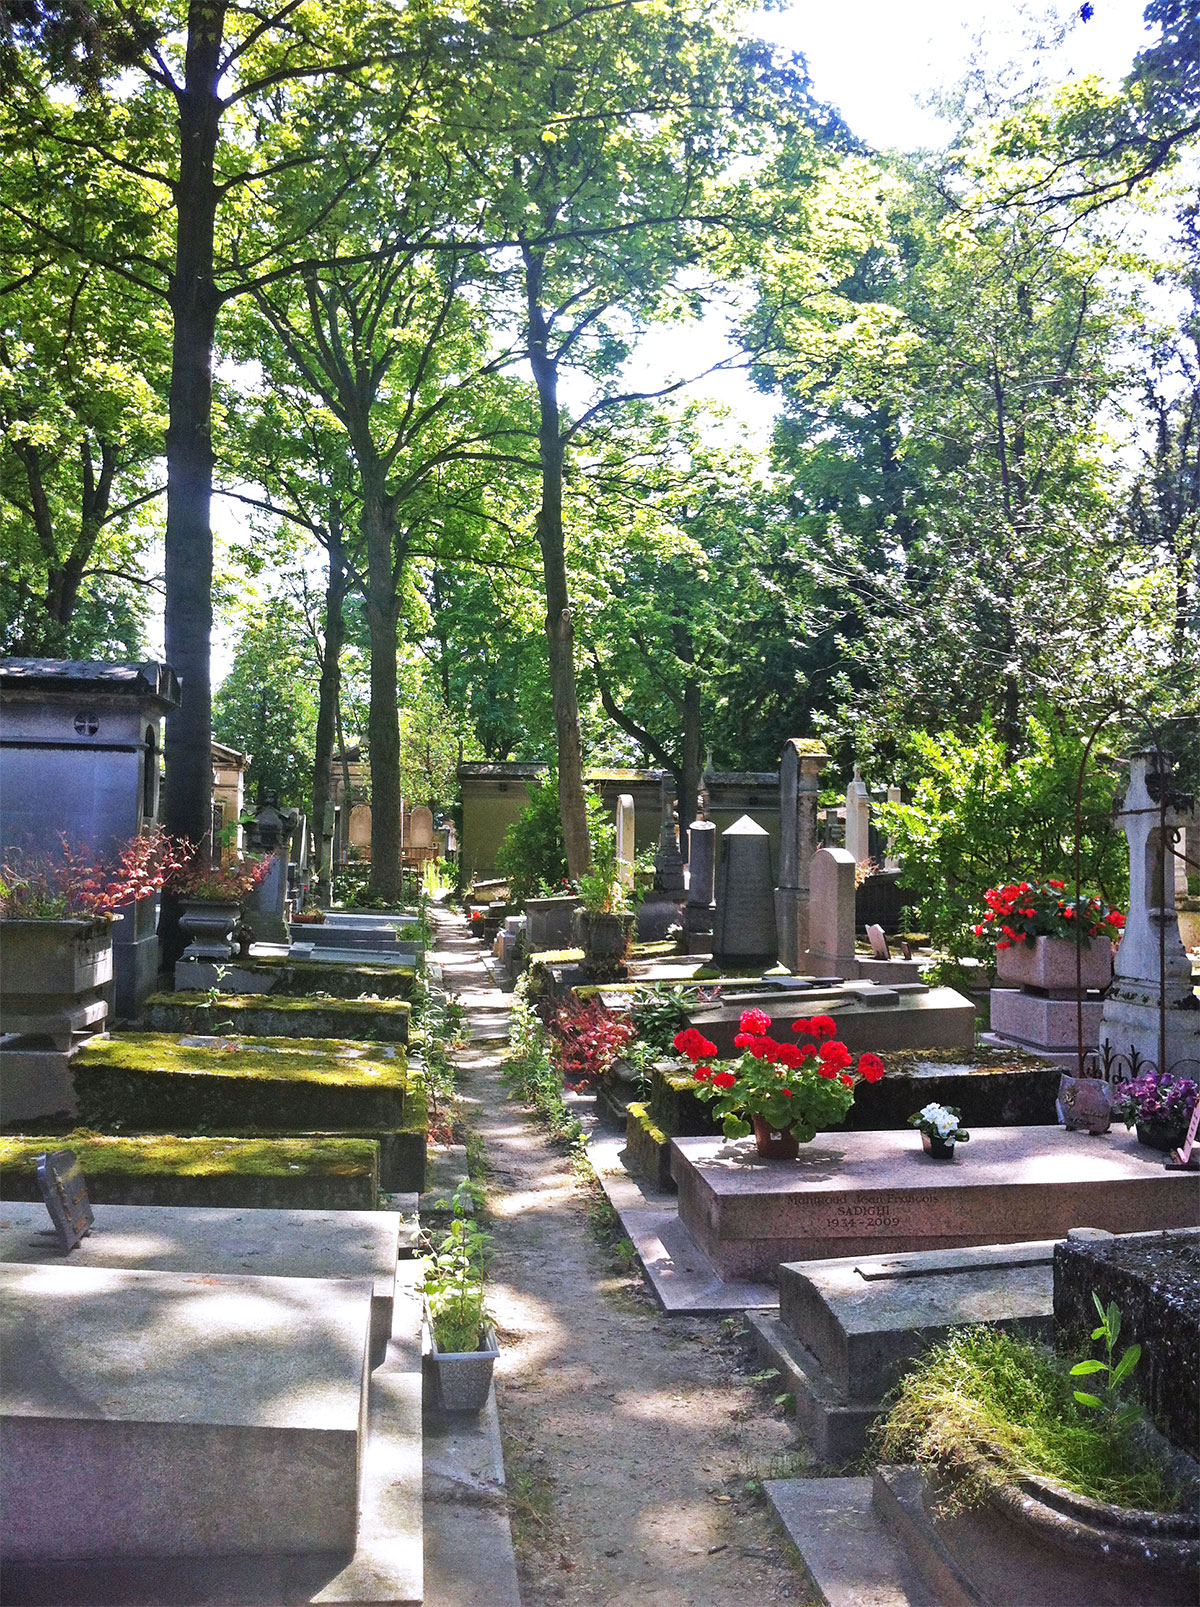 Paris pere lachaise cemetery   Paris Neighborhoods Explained